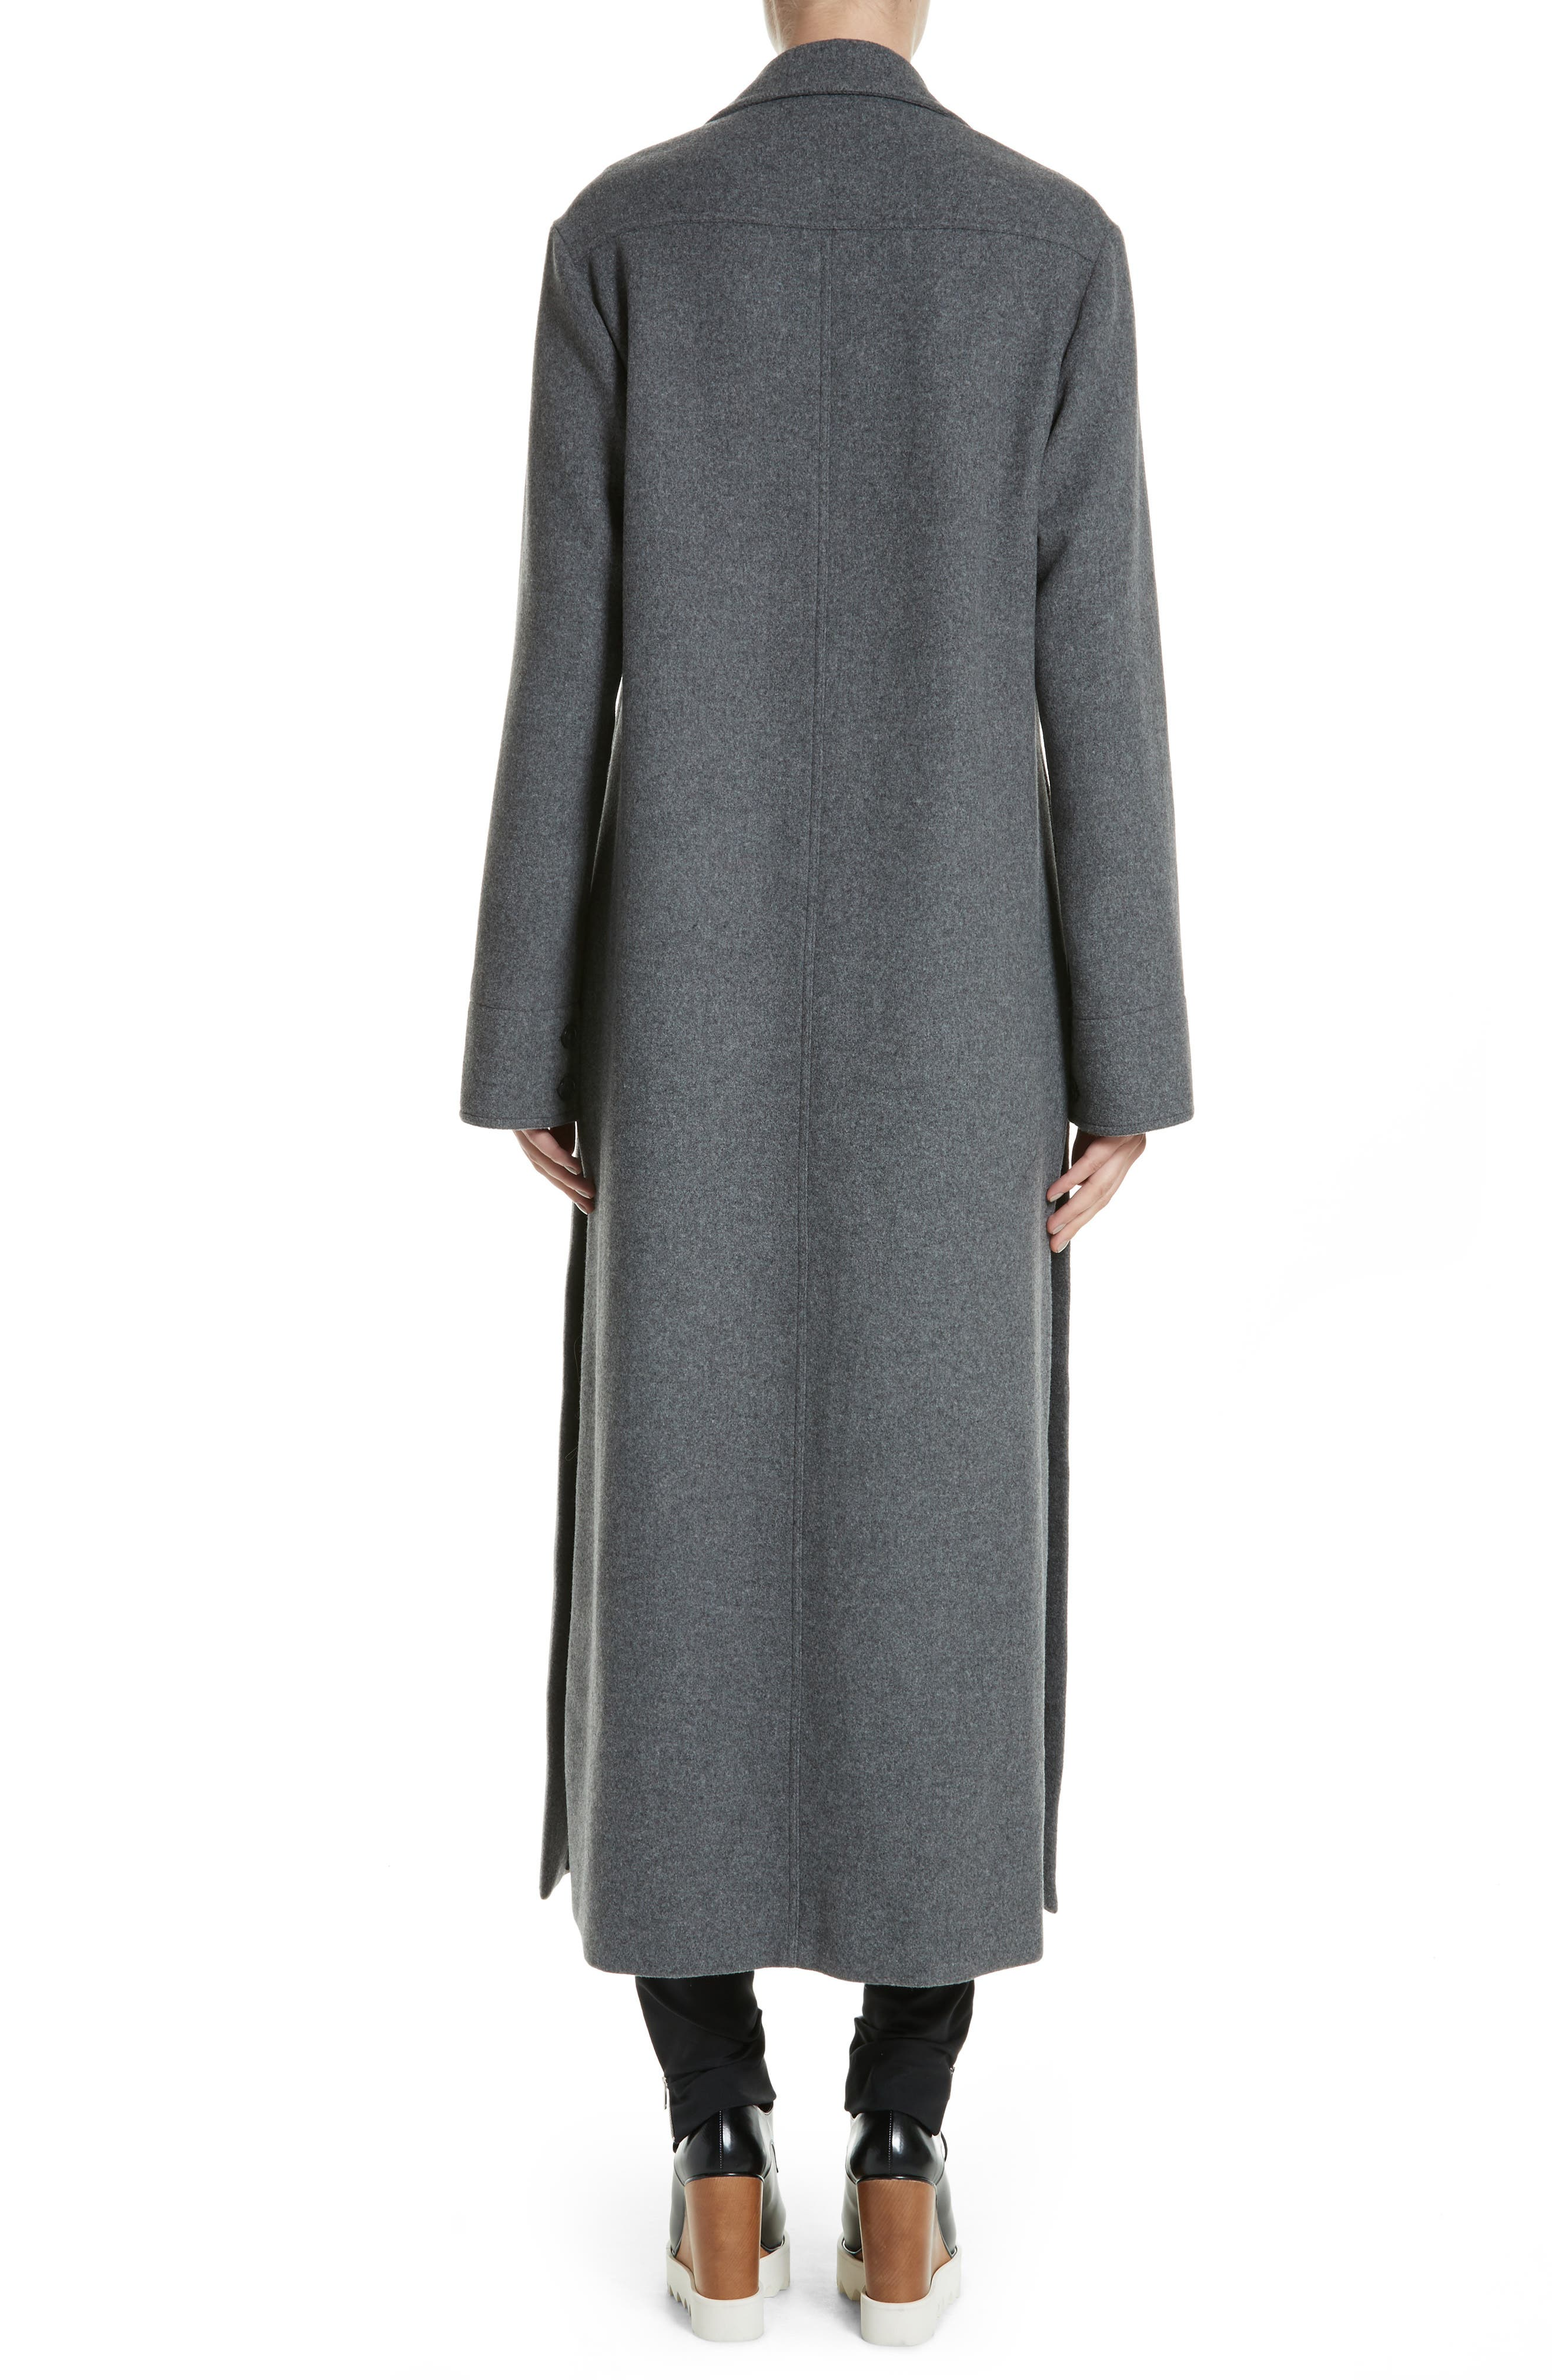 Edwina Long Double Breasted Wool Blend Coat,                             Alternate thumbnail 2, color,                             076